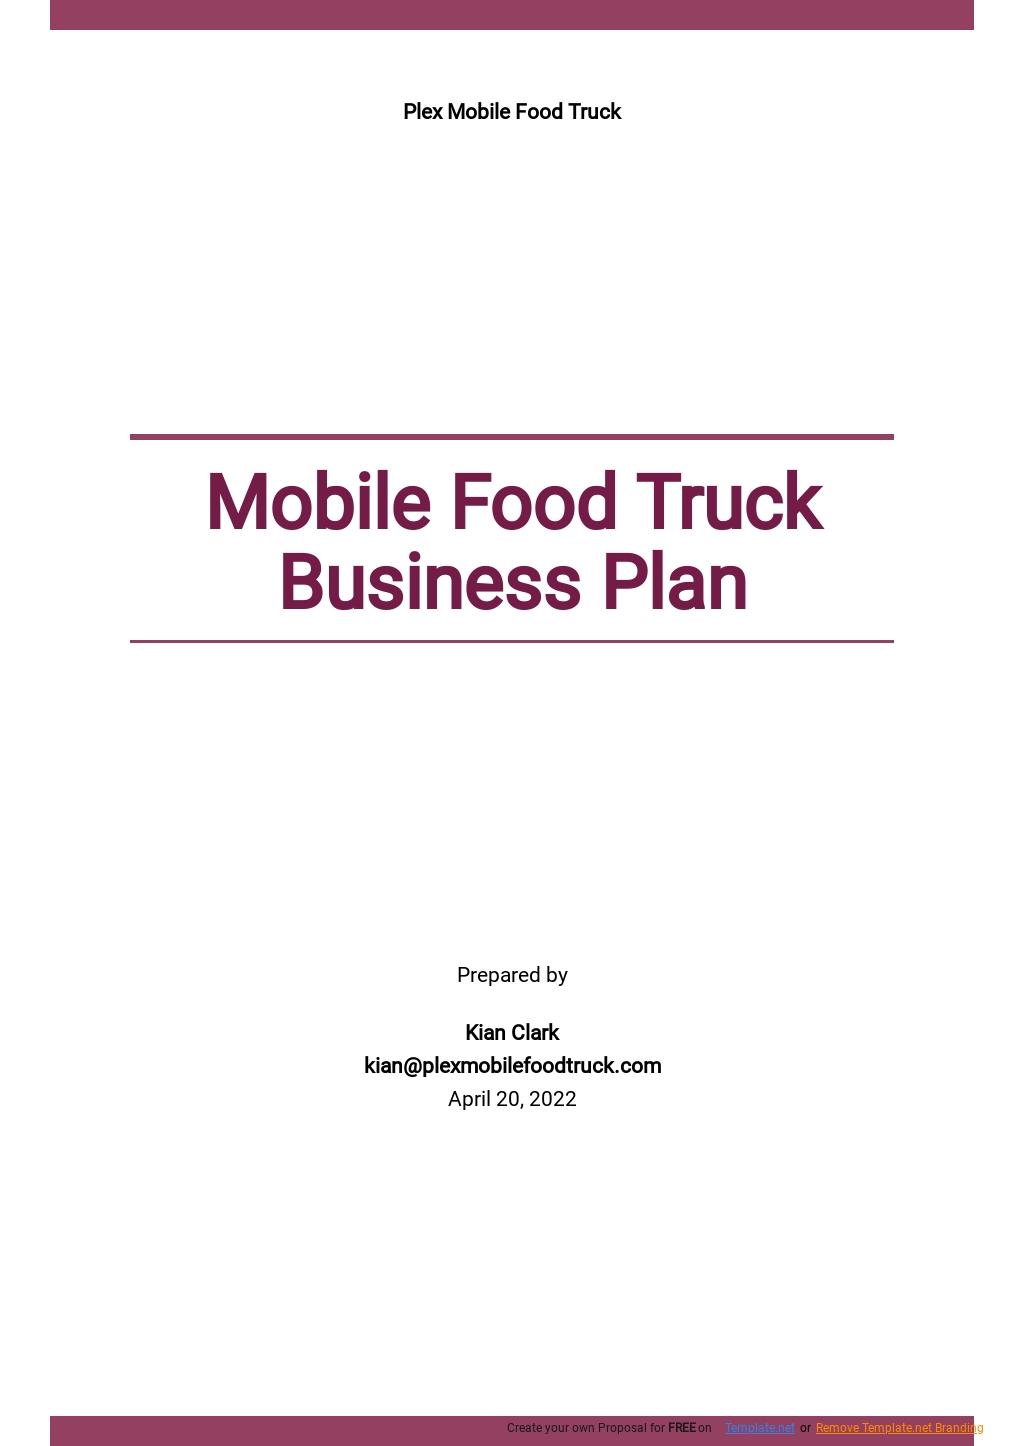 Mobile Food Truck Business Plan Sample.jpe